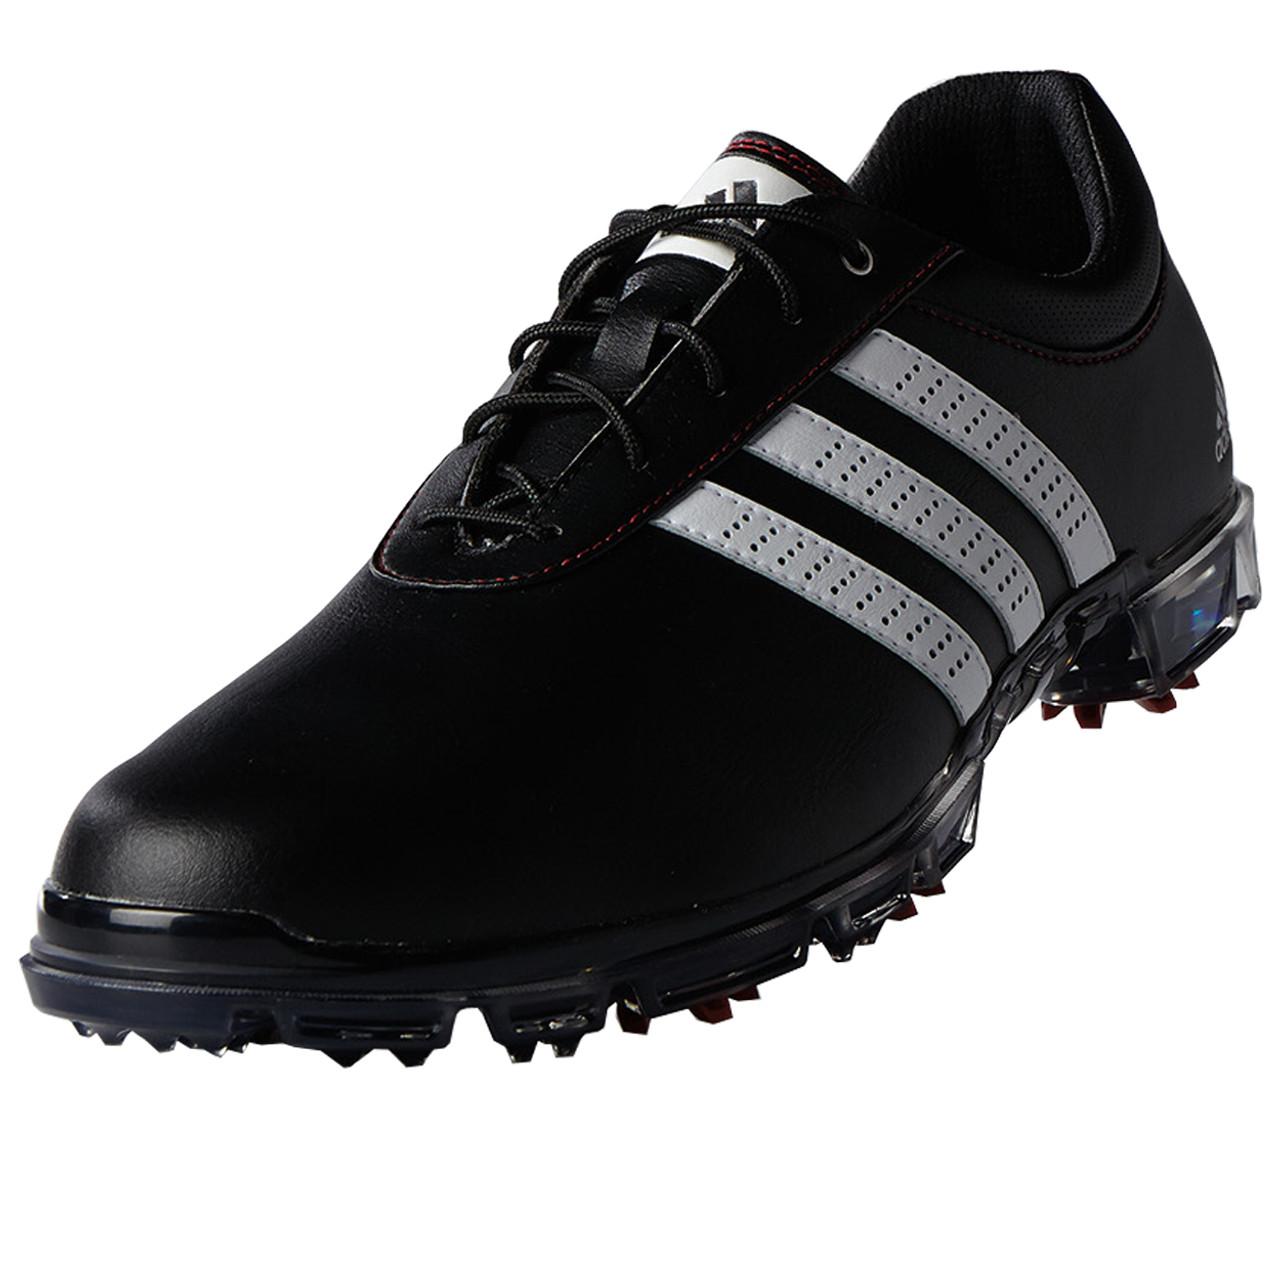 Adidas adipure Flex Golf Shoe